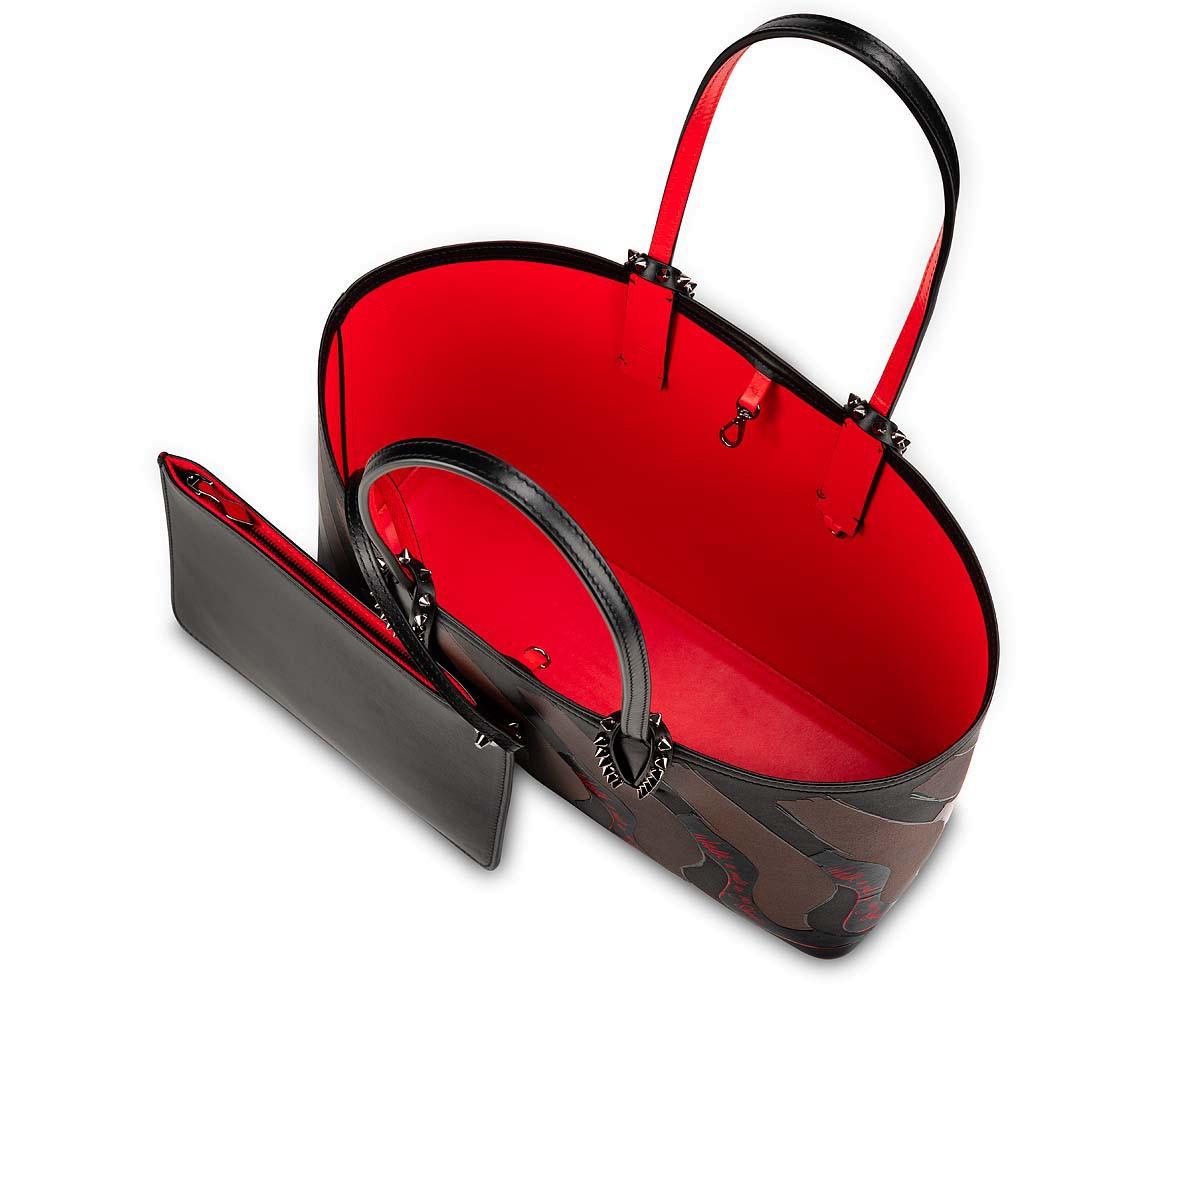 Bags - Cabata Small Tote Bag - Christian Louboutin